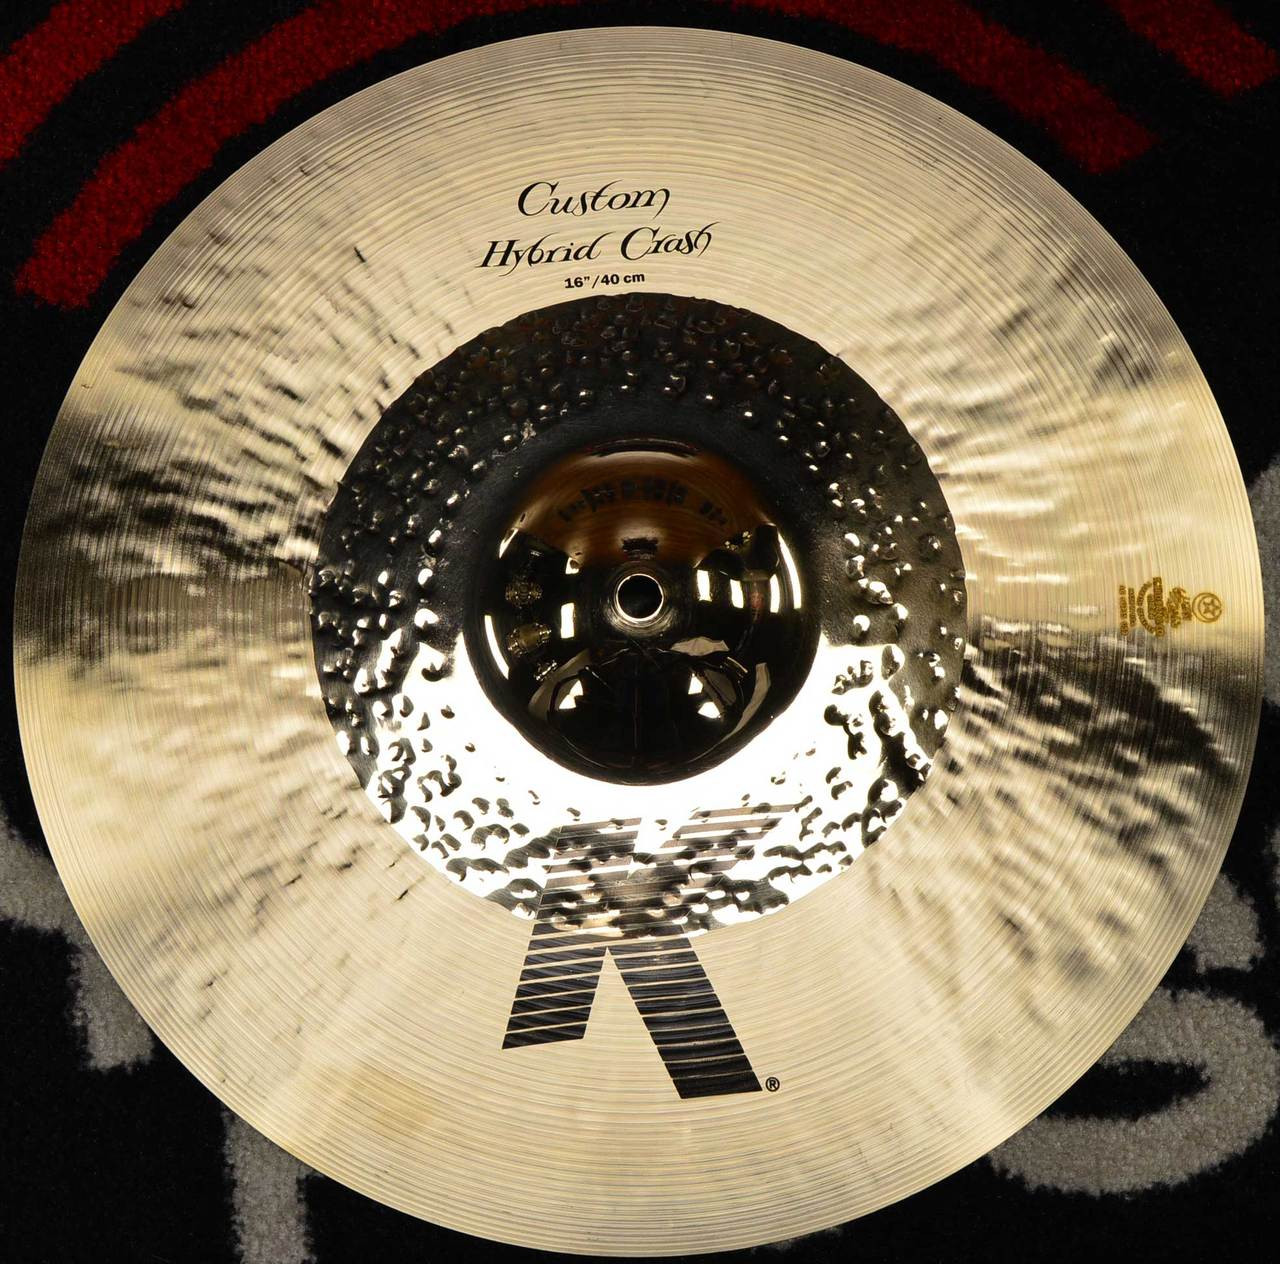 zildjian 16 k custom hybrid crash cymbal. Black Bedroom Furniture Sets. Home Design Ideas